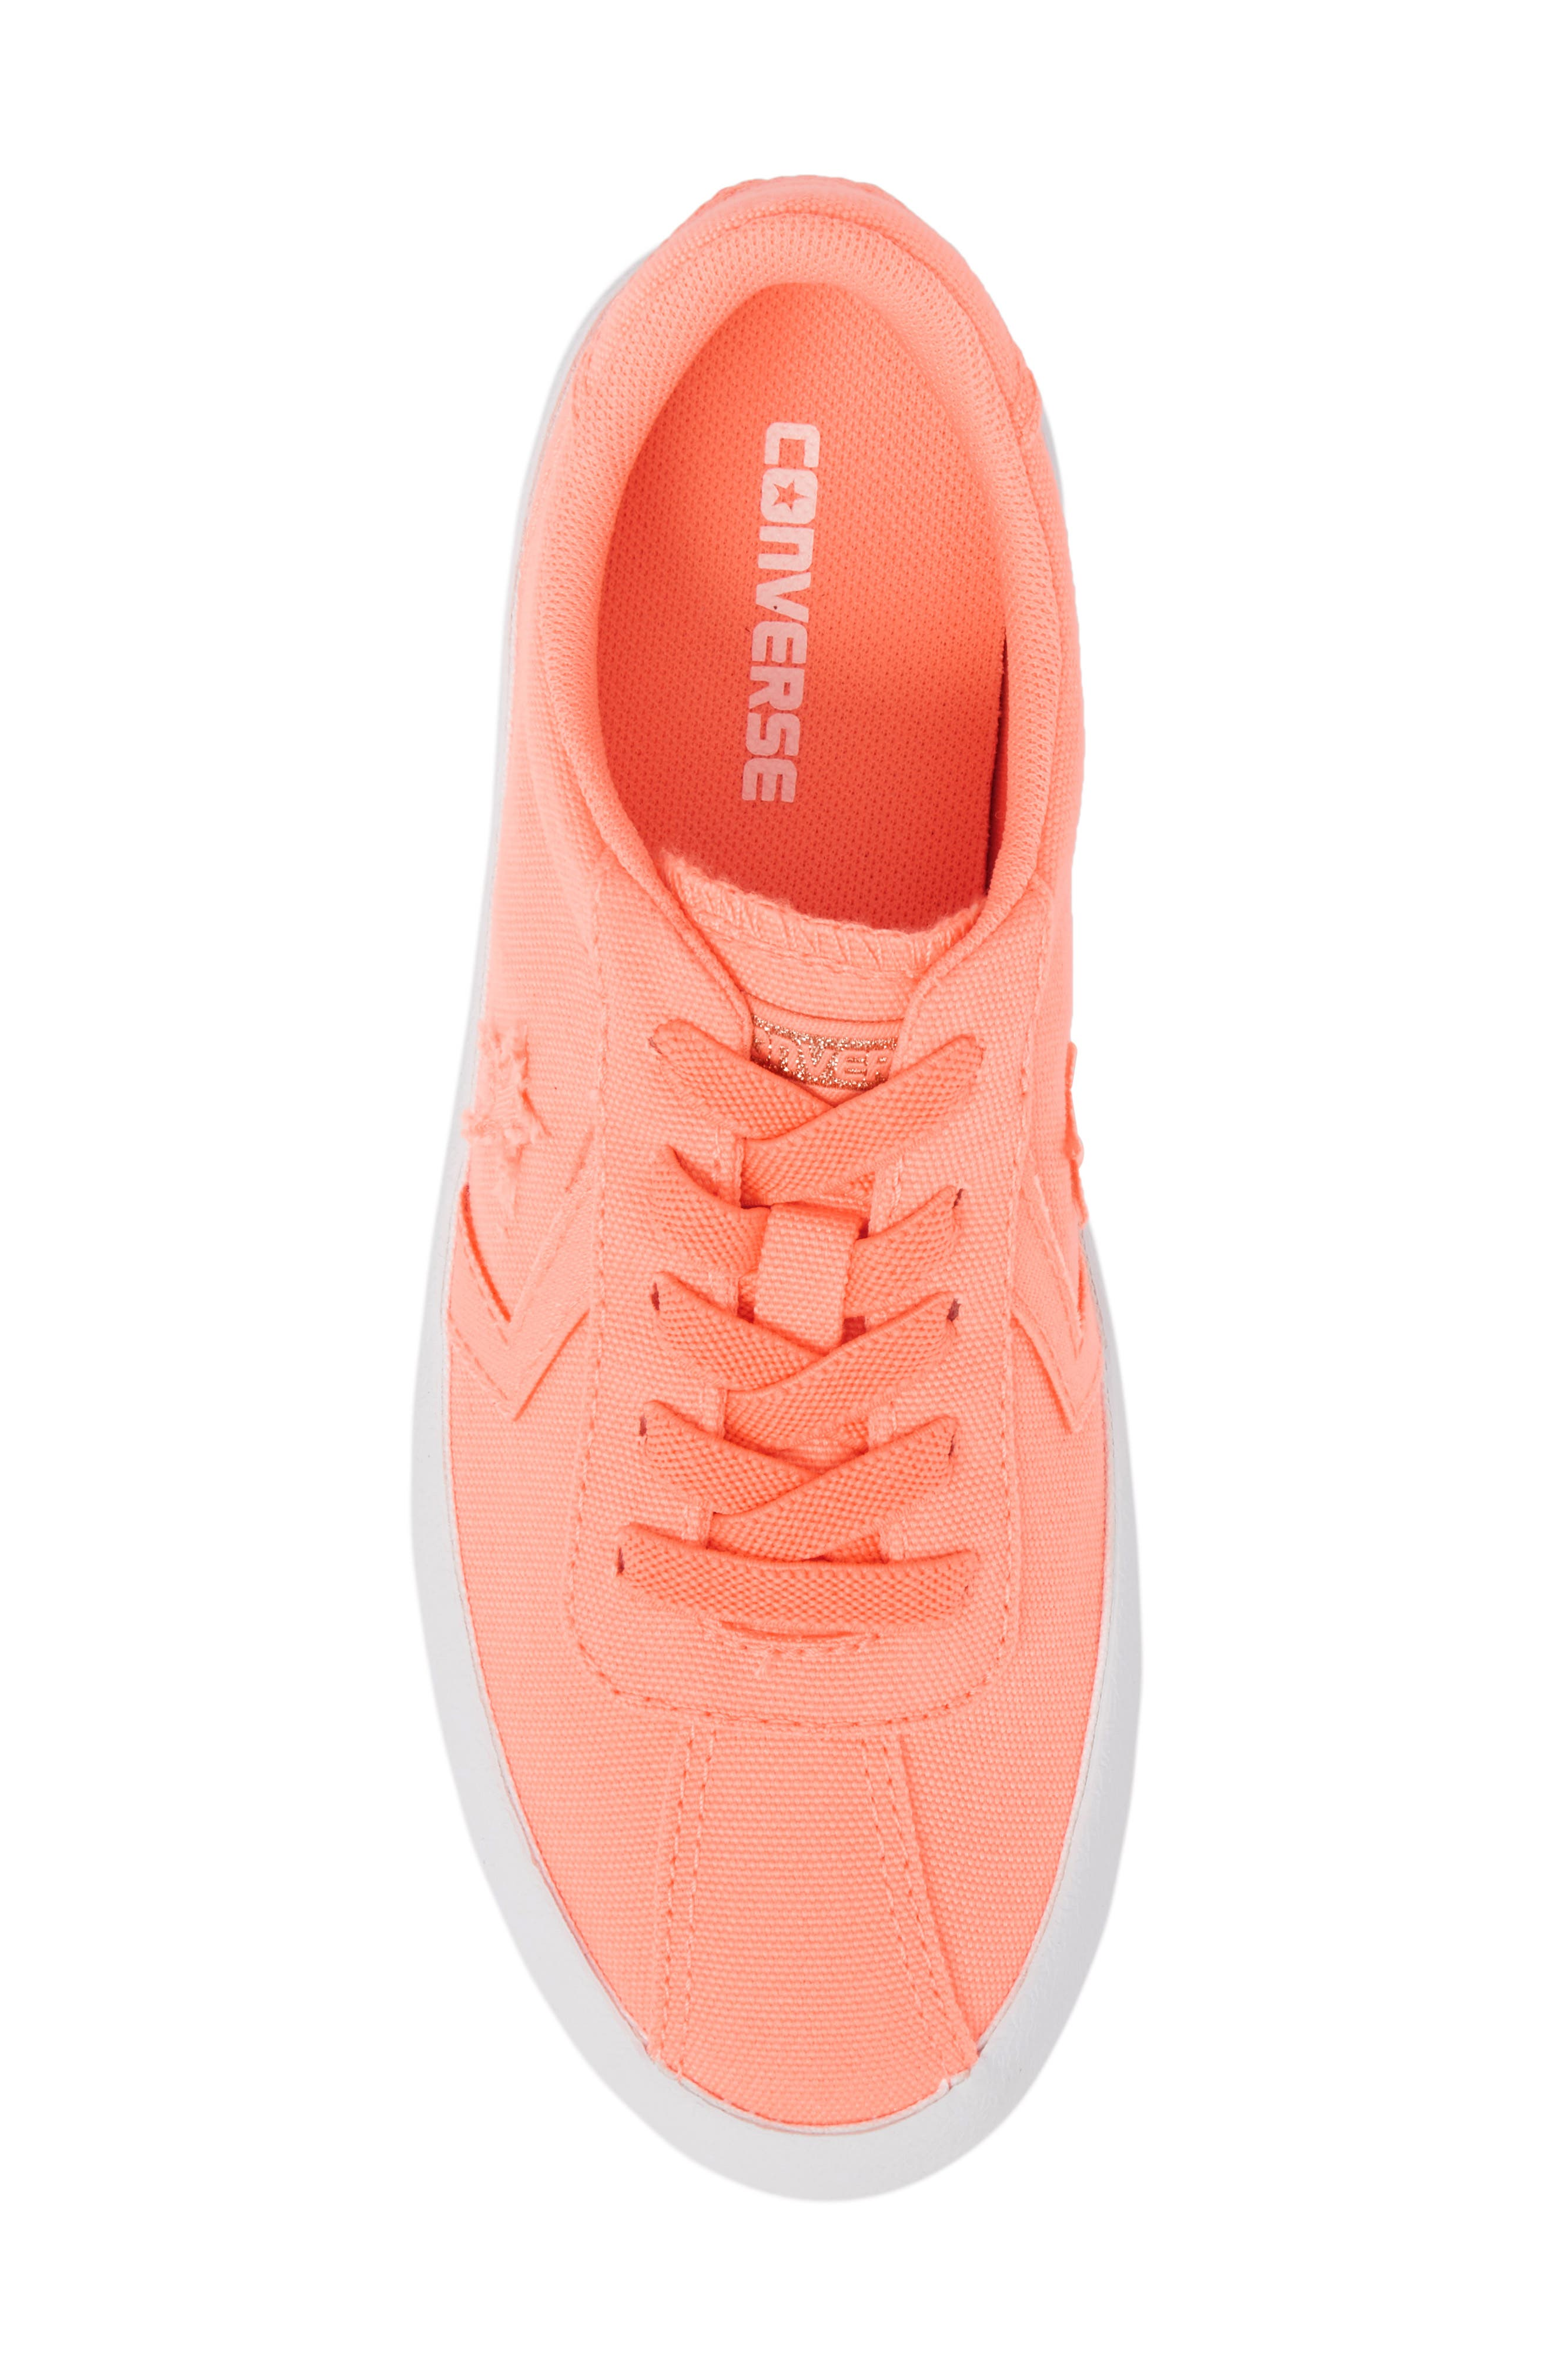 Breakpoint Sneaker,                             Alternate thumbnail 5, color,                             Crimson